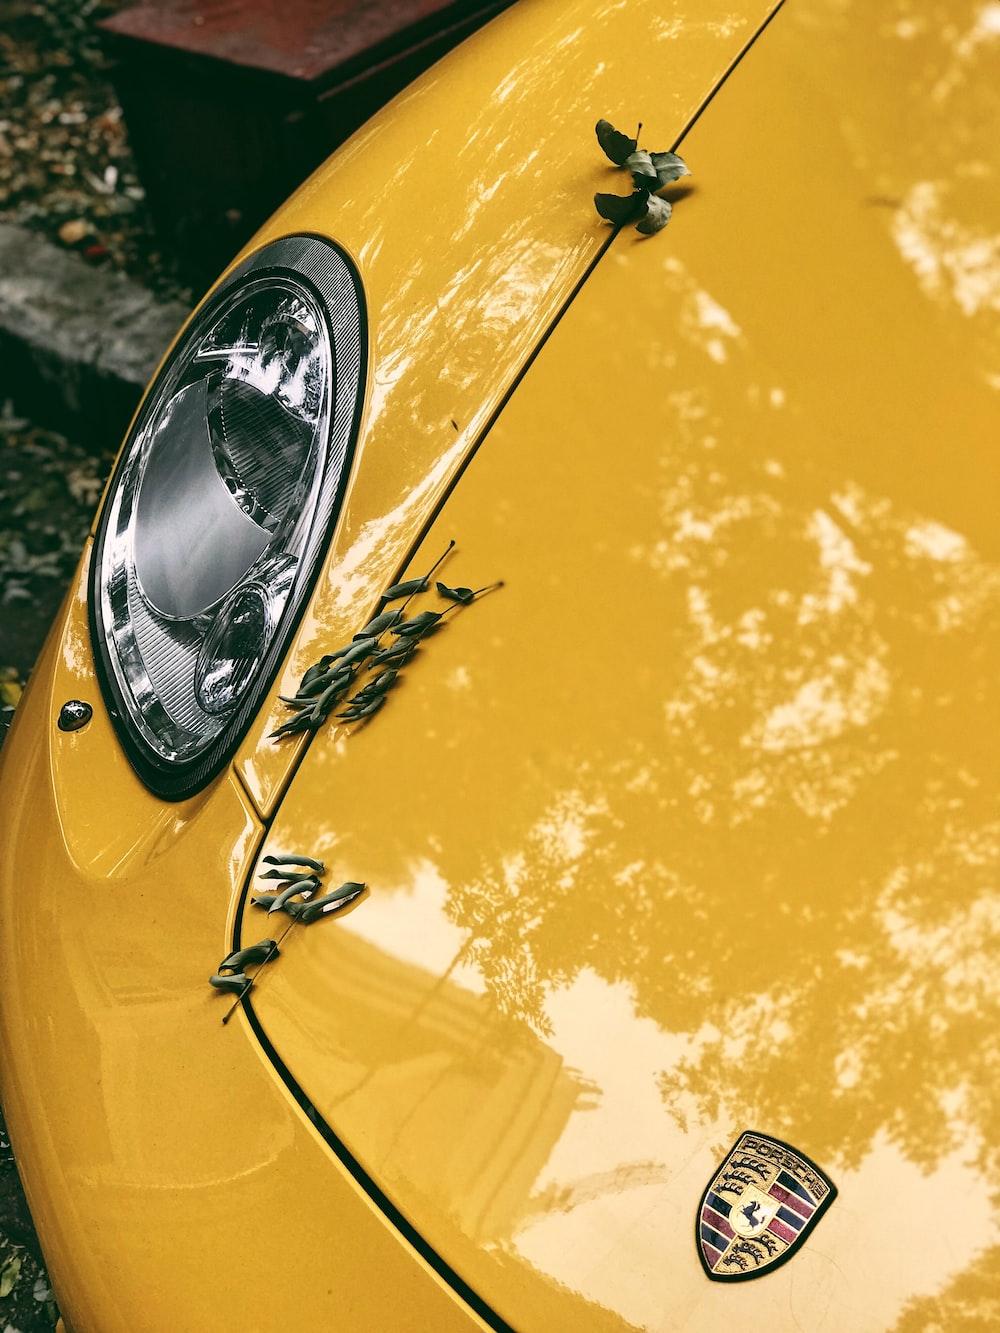 yellow Lamborghini vehicle